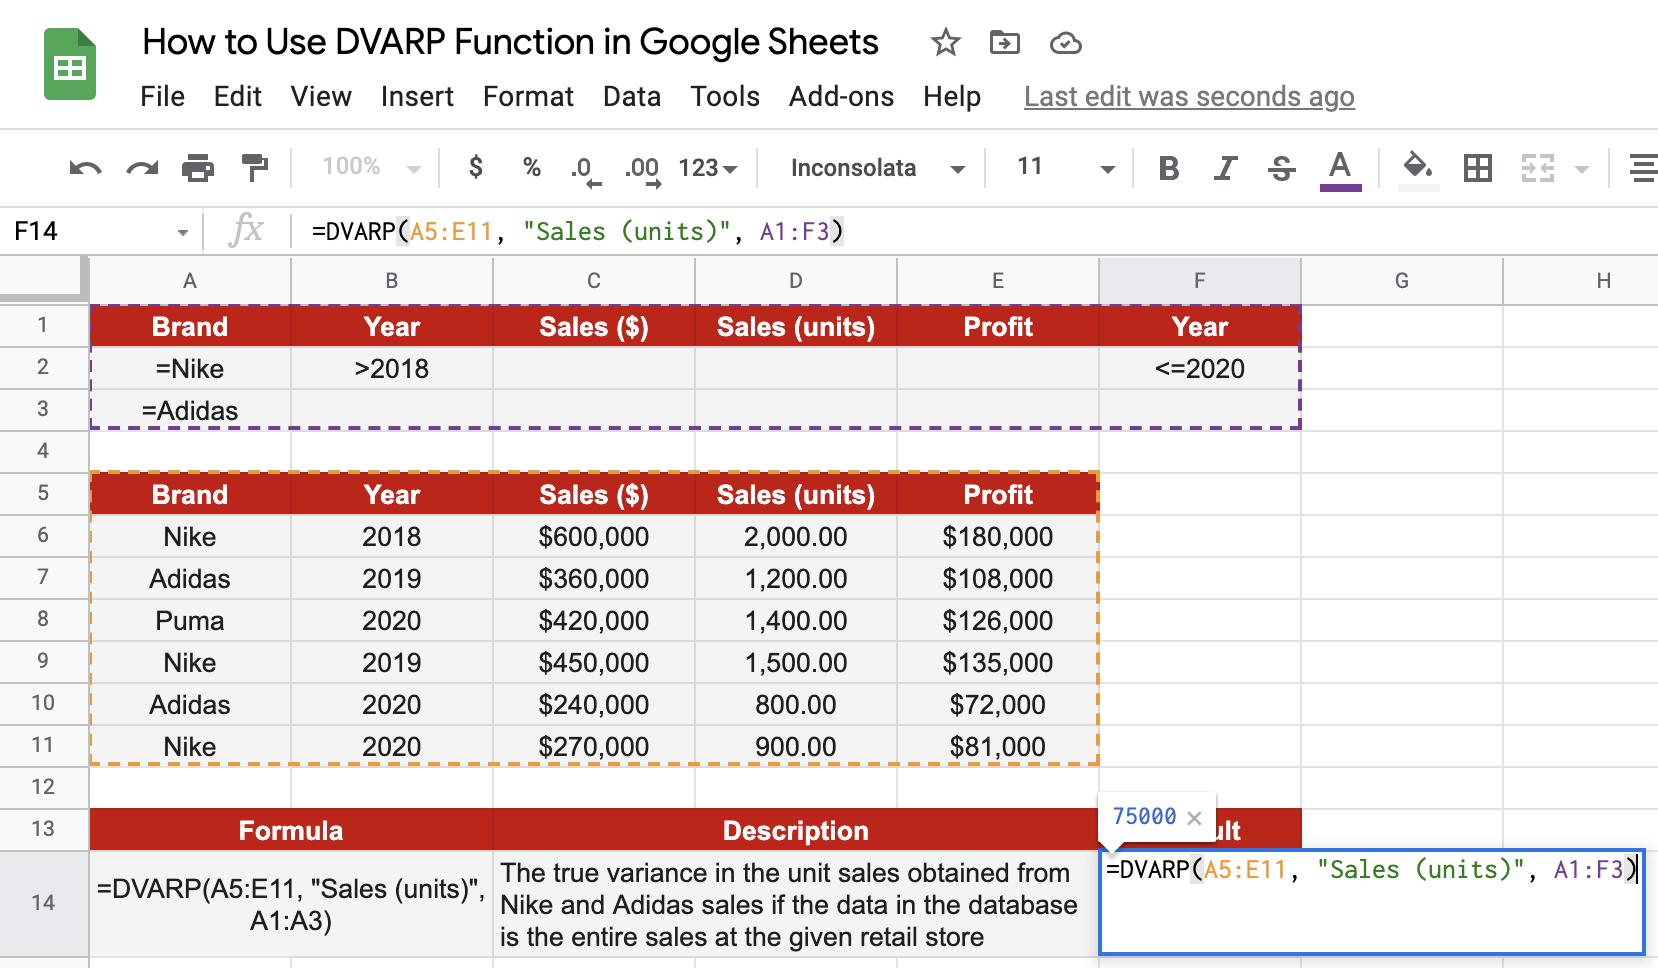 DVARP function in Google Sheets